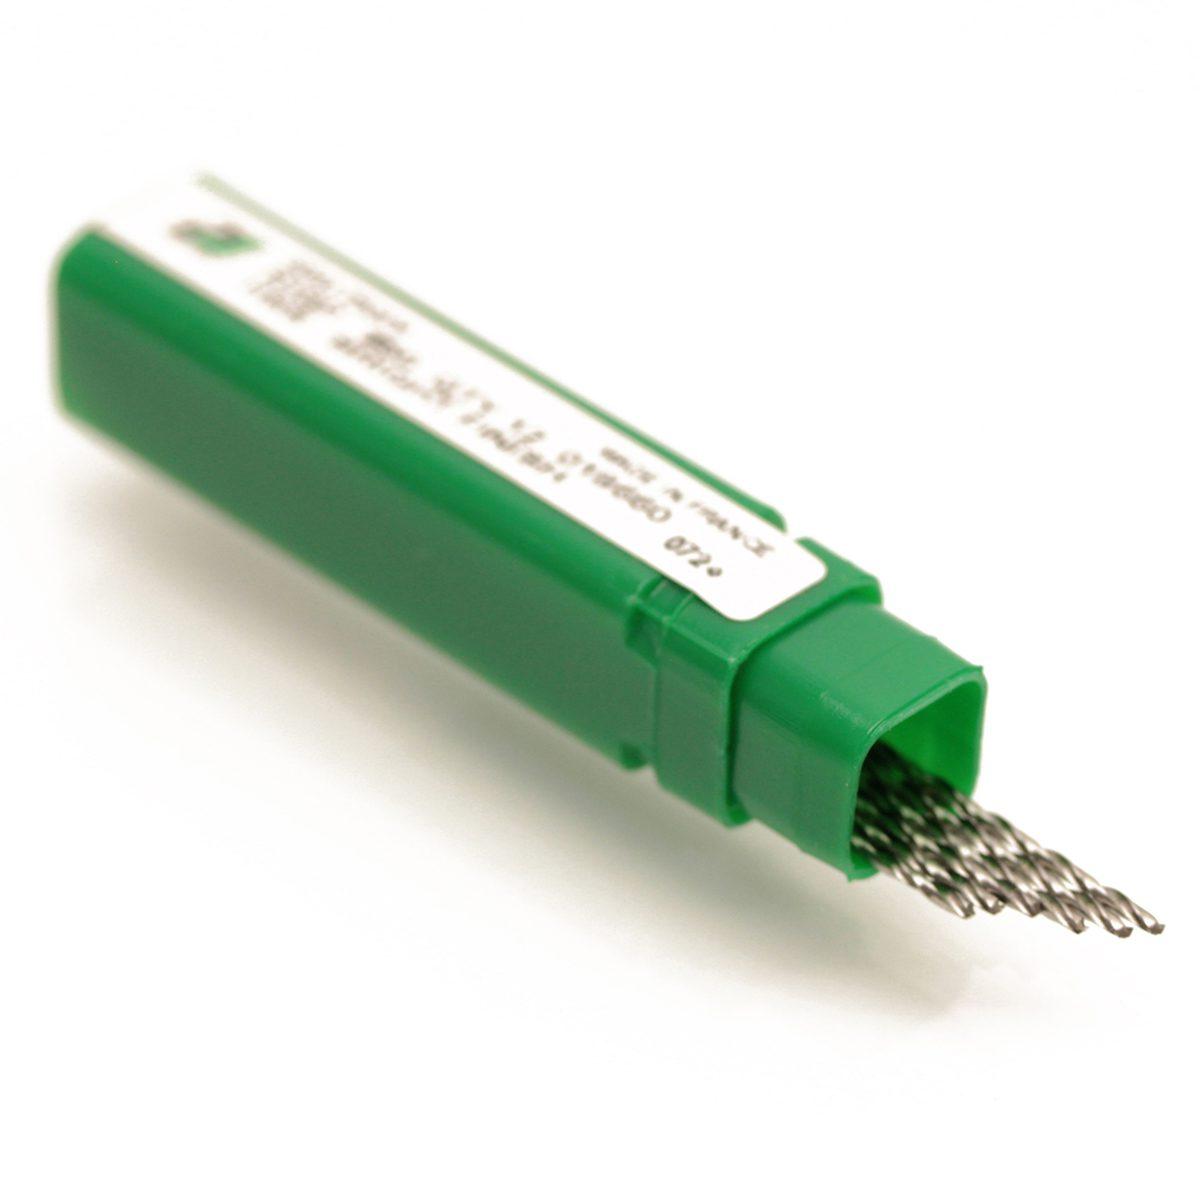 ptfe insert jig replacement drill 2